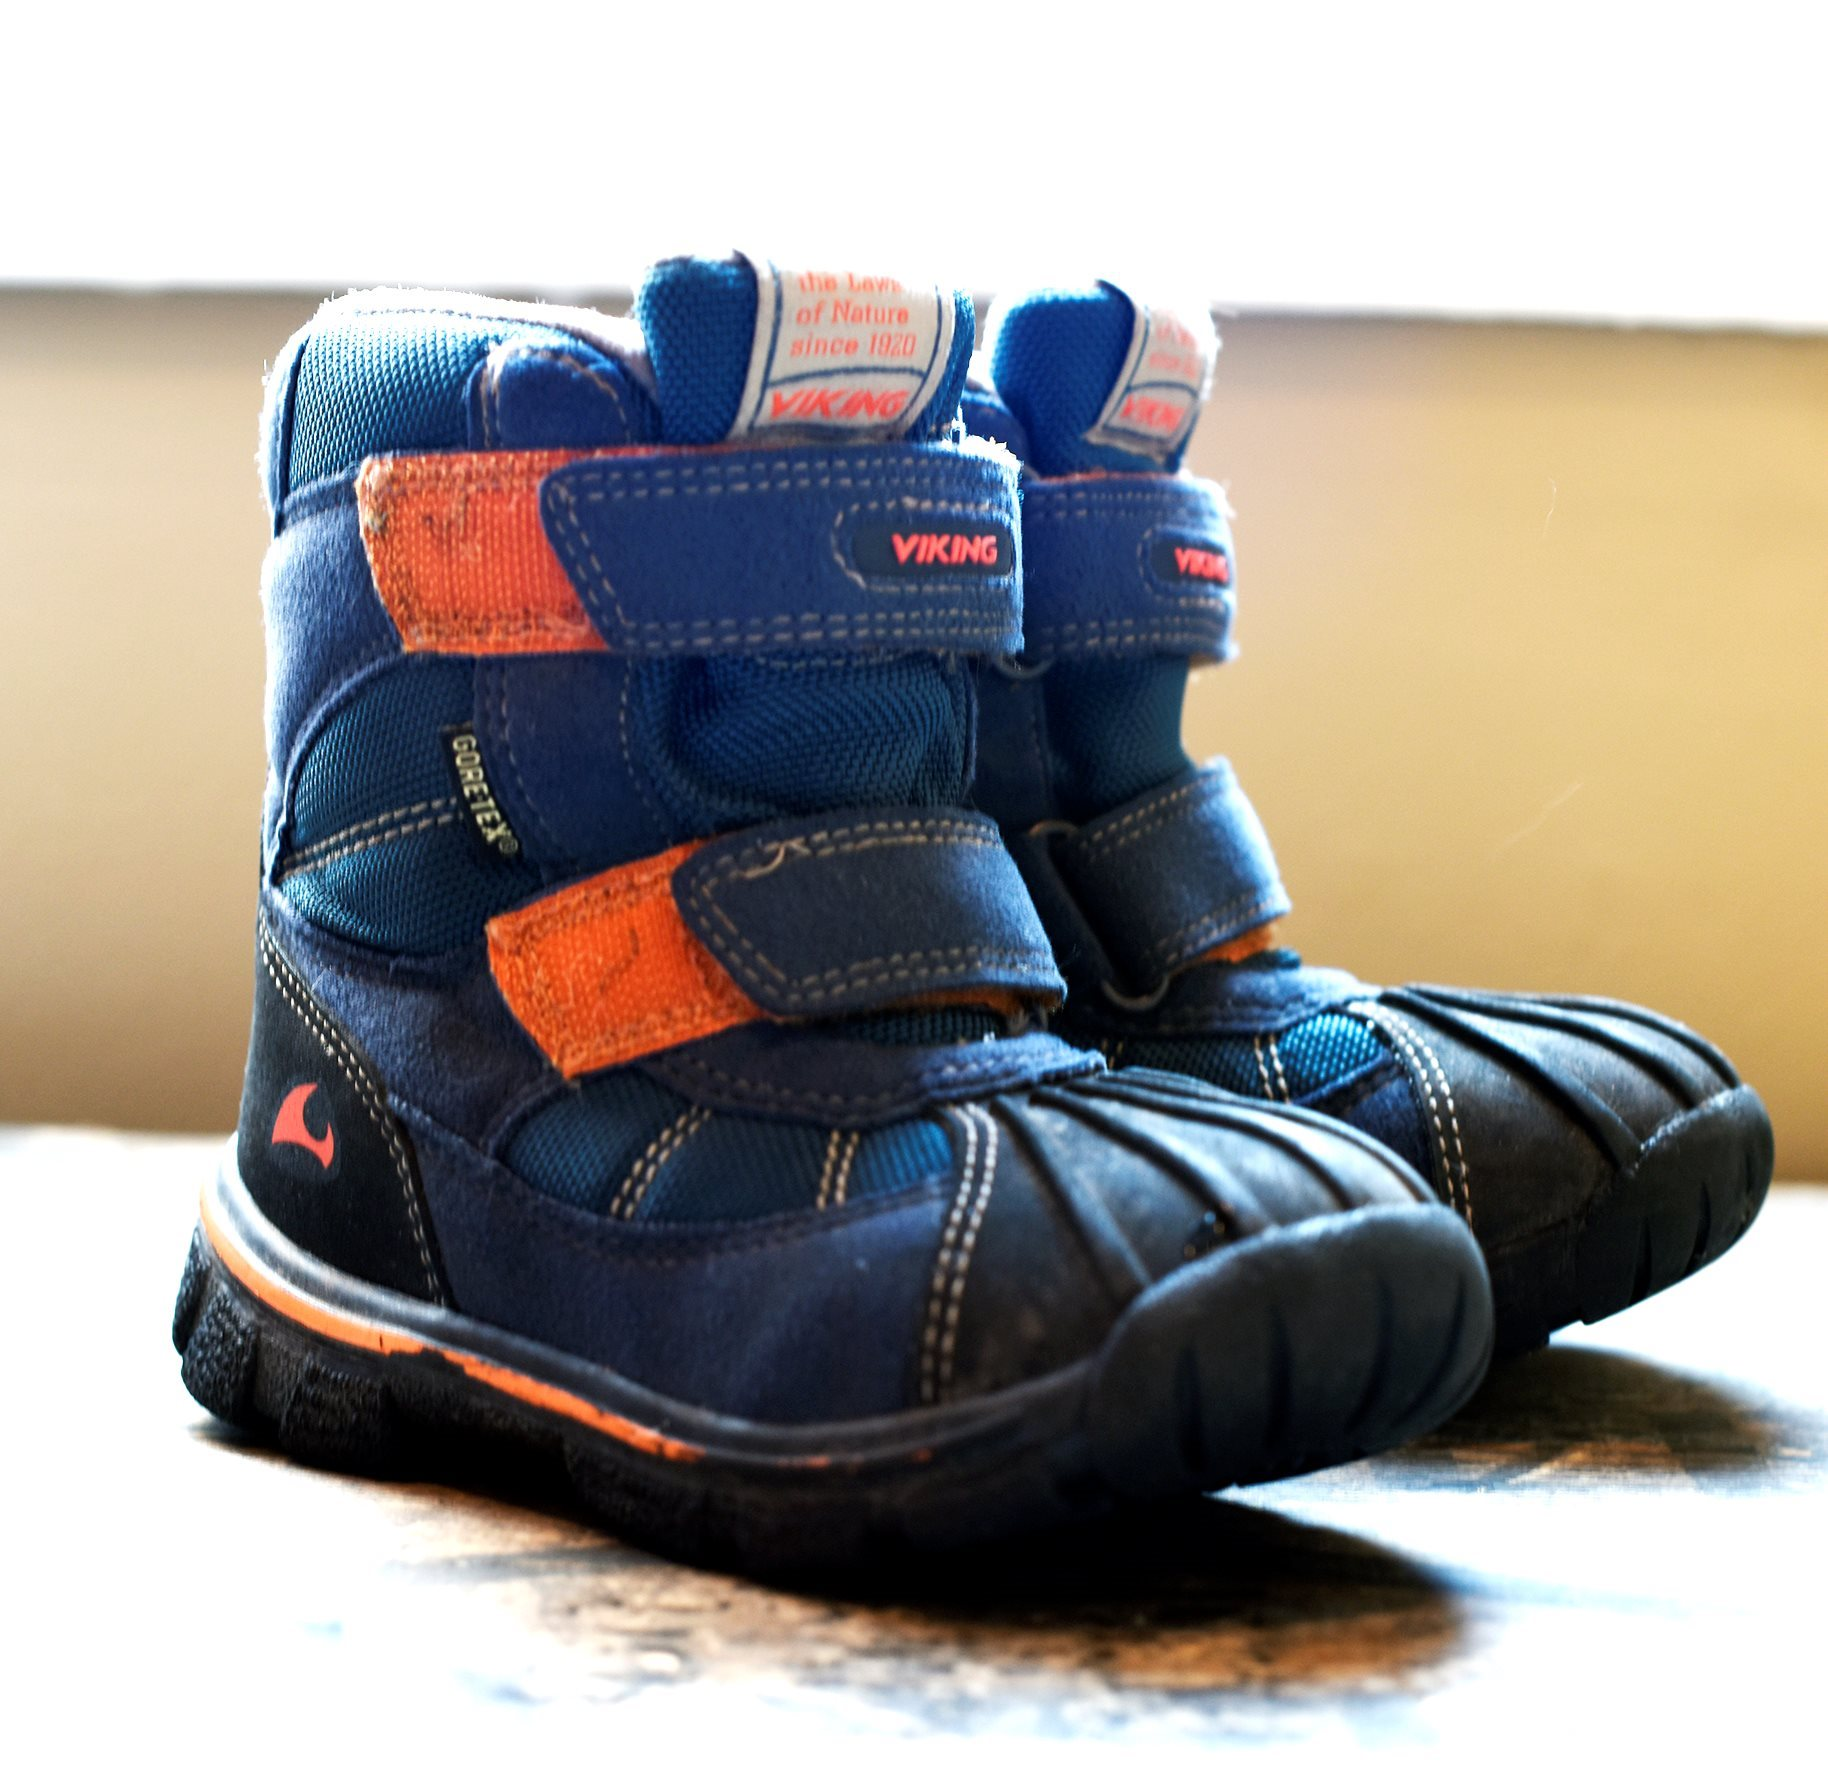 24e75c172d1 Viking Gore Tex skor/vinterkängor i strl. 28 (336619245) ᐈ Köp på ...